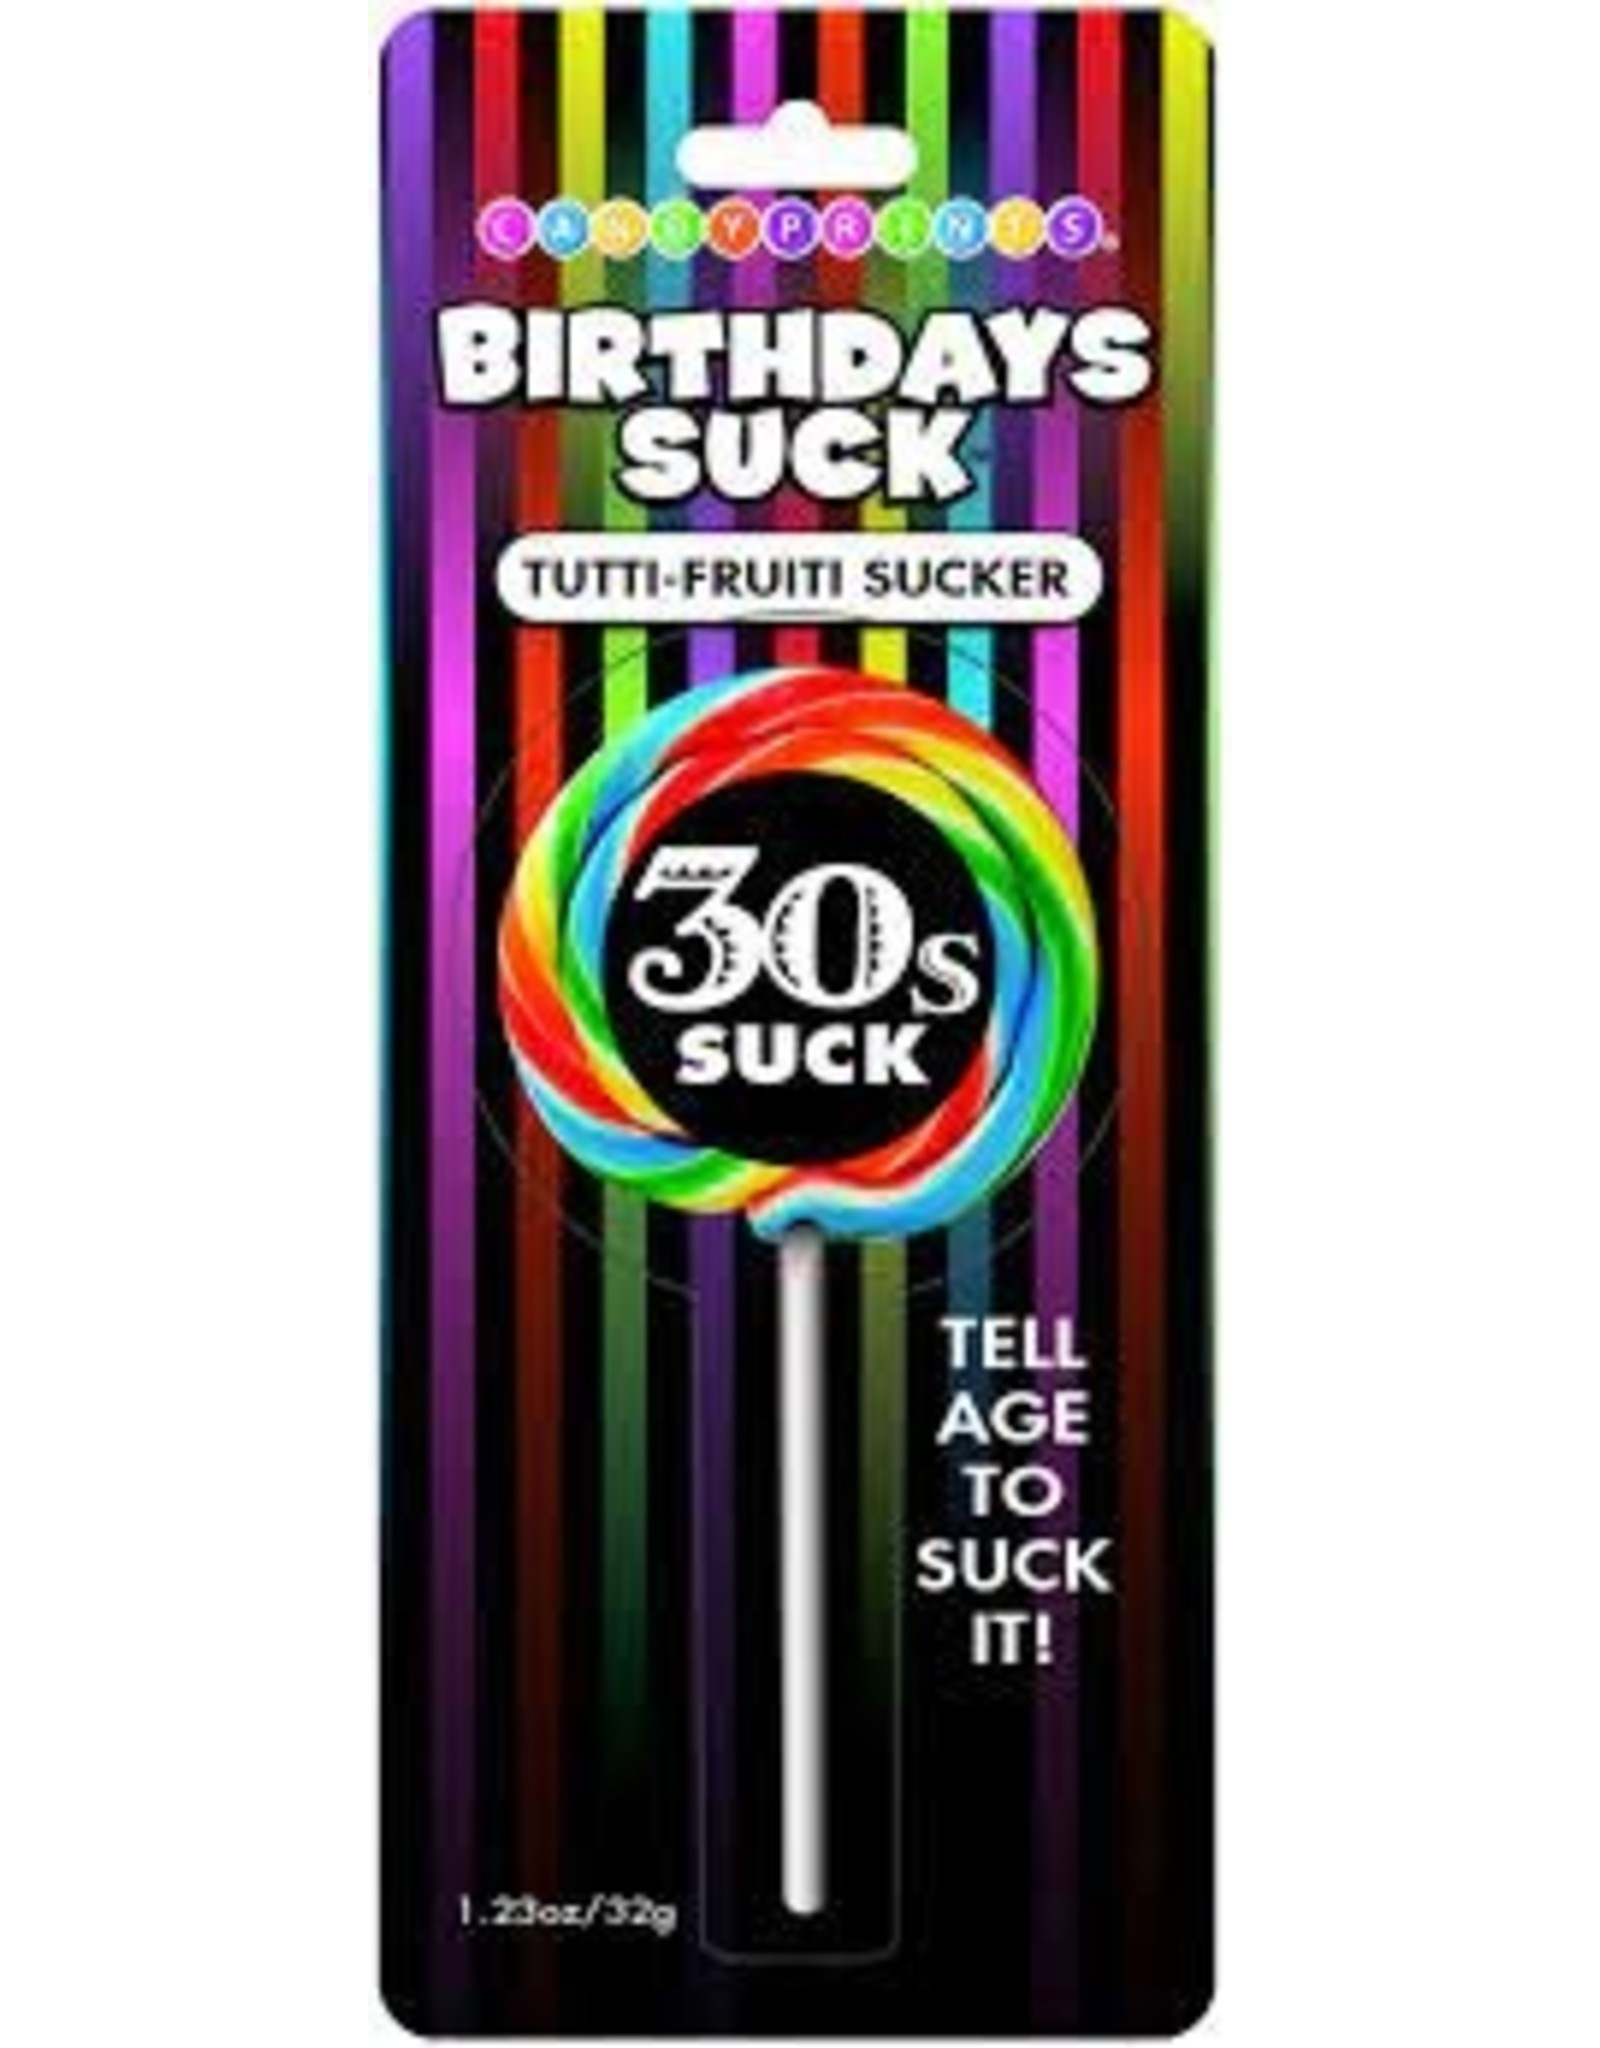 Birthday's Suck Lollipop-30s